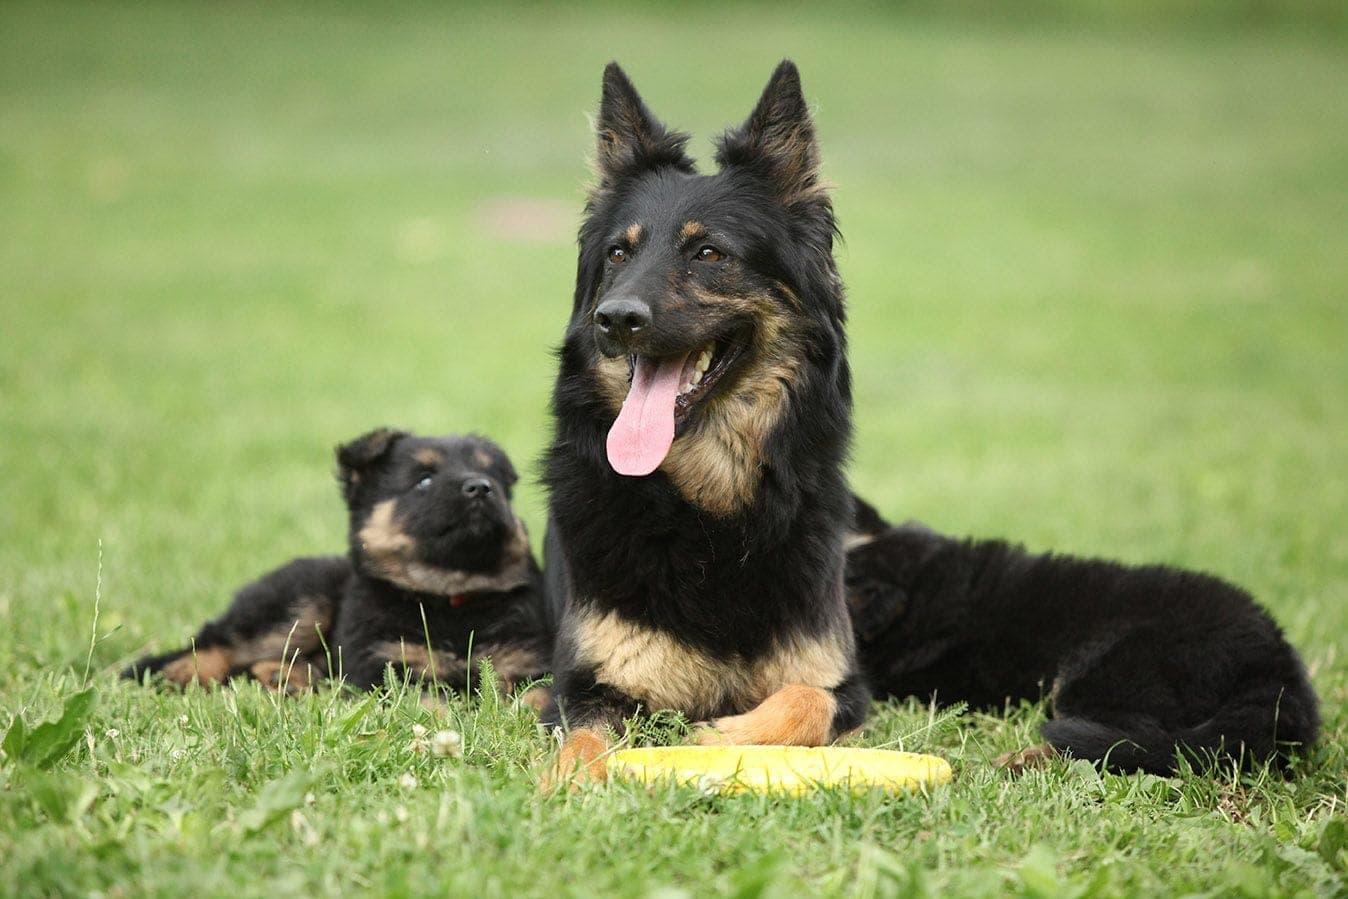 Bohemian Shepherd dog and puppy